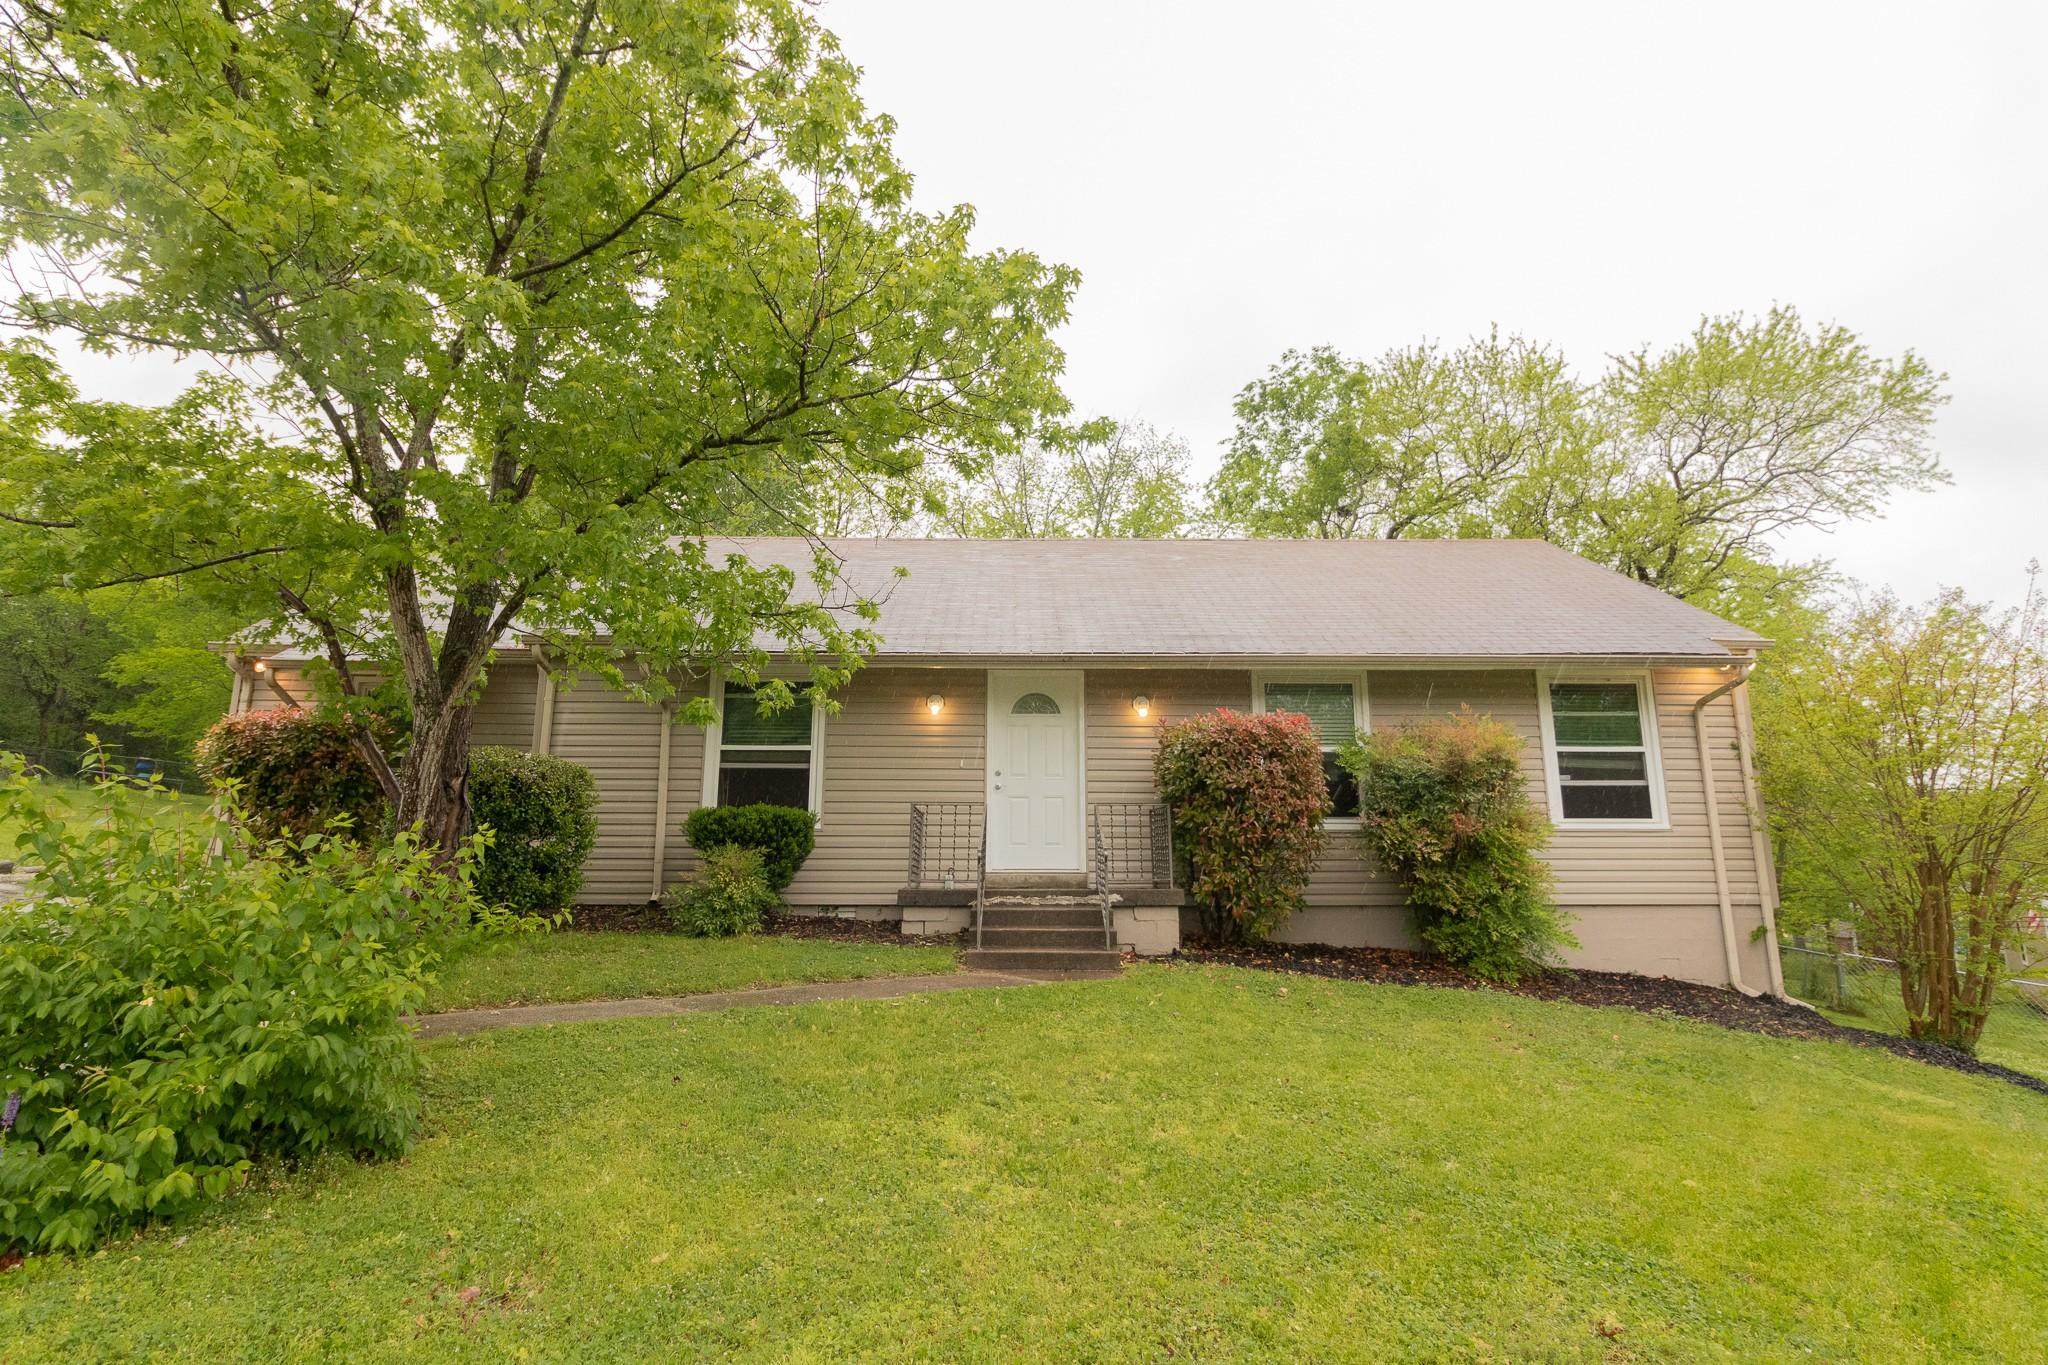 104 Cedar Ct Property Photo - Hendersonville, TN real estate listing